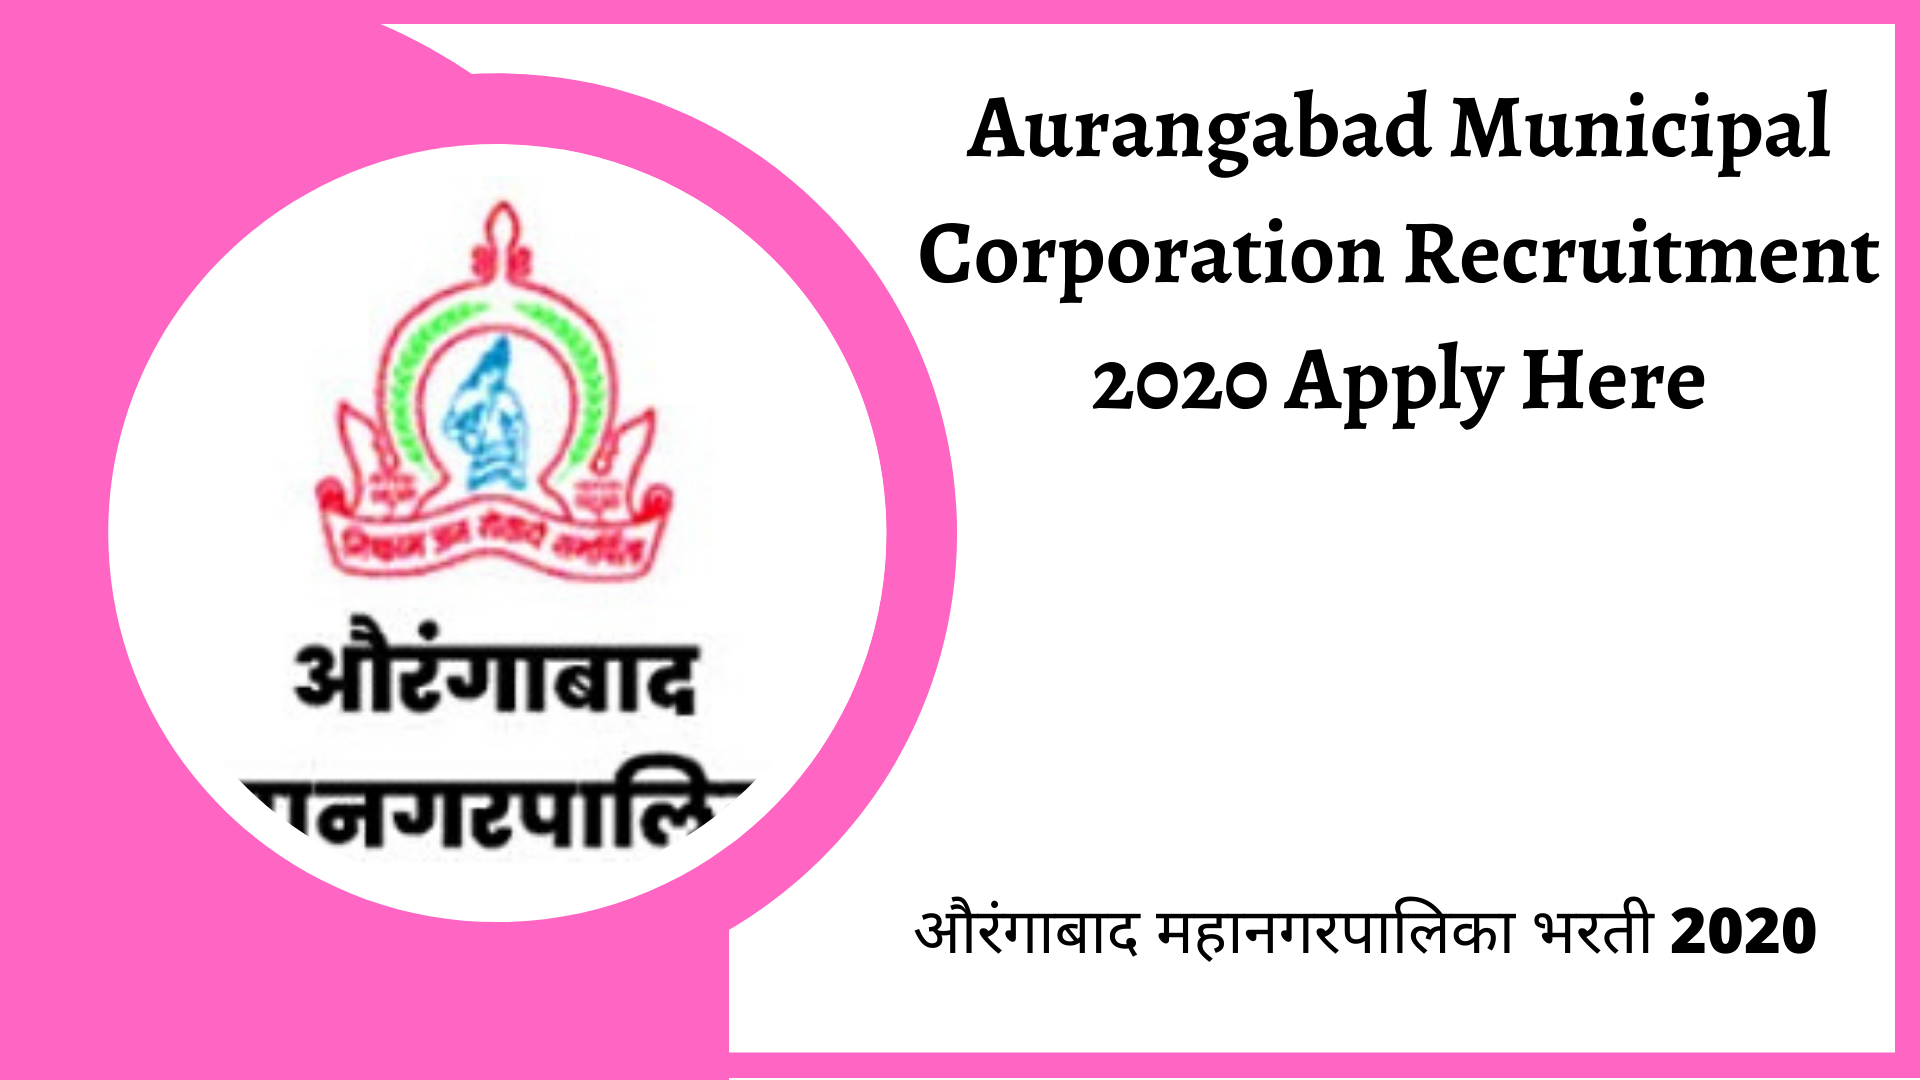 Aurangabad Municipal Corporation Recruitment 2020 Apply Here